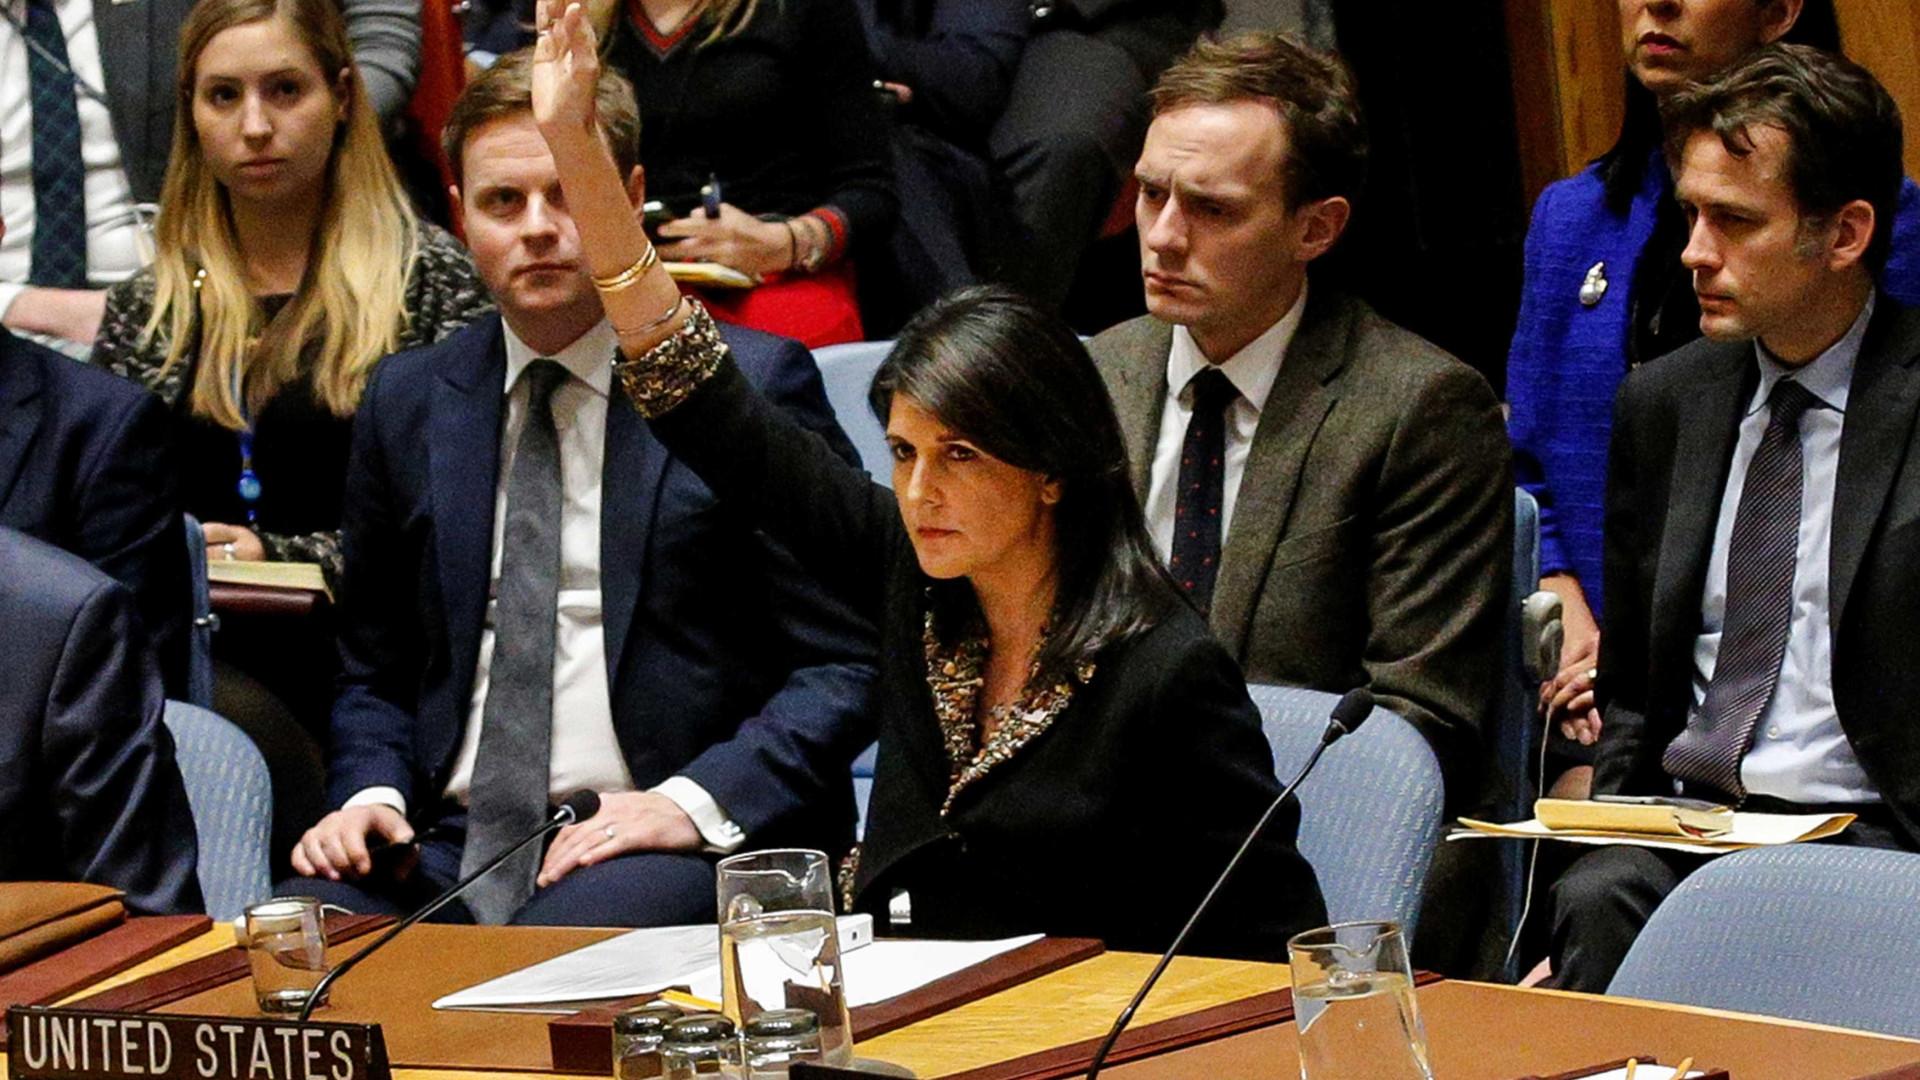 Governo Trump veta resolução na ONU sobre Jerusalém